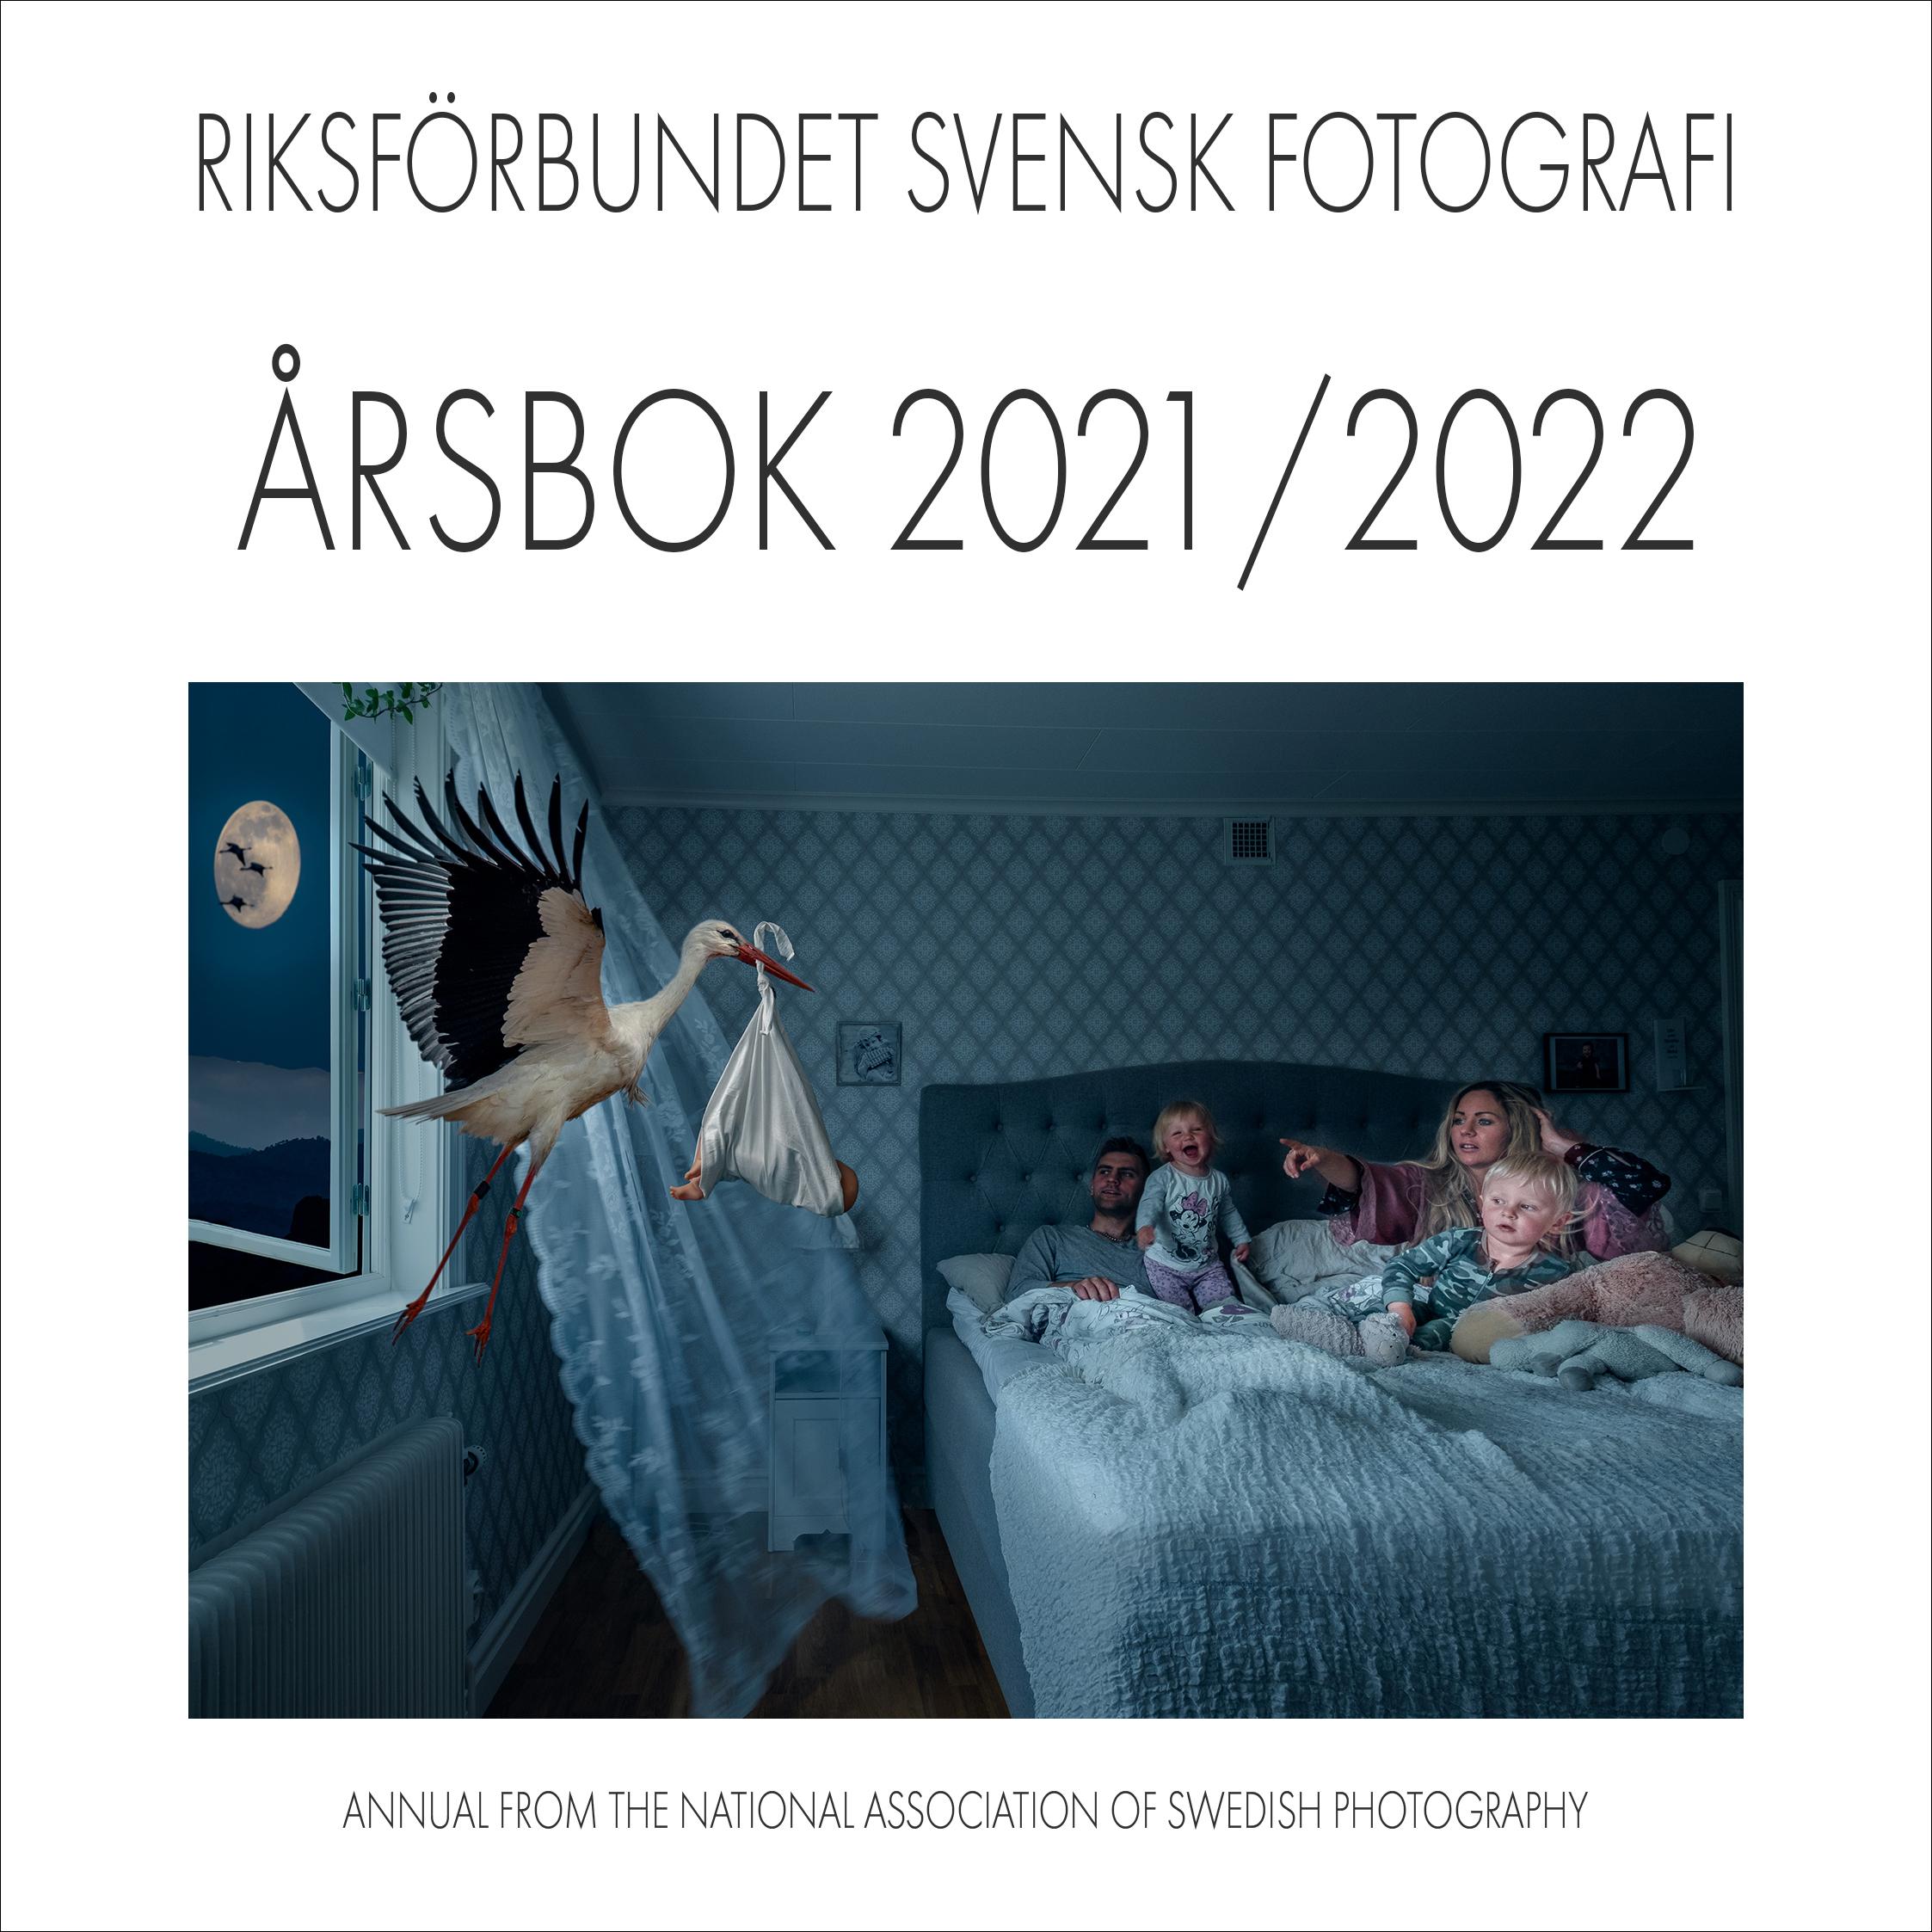 ÅRSBOK 2021/2022